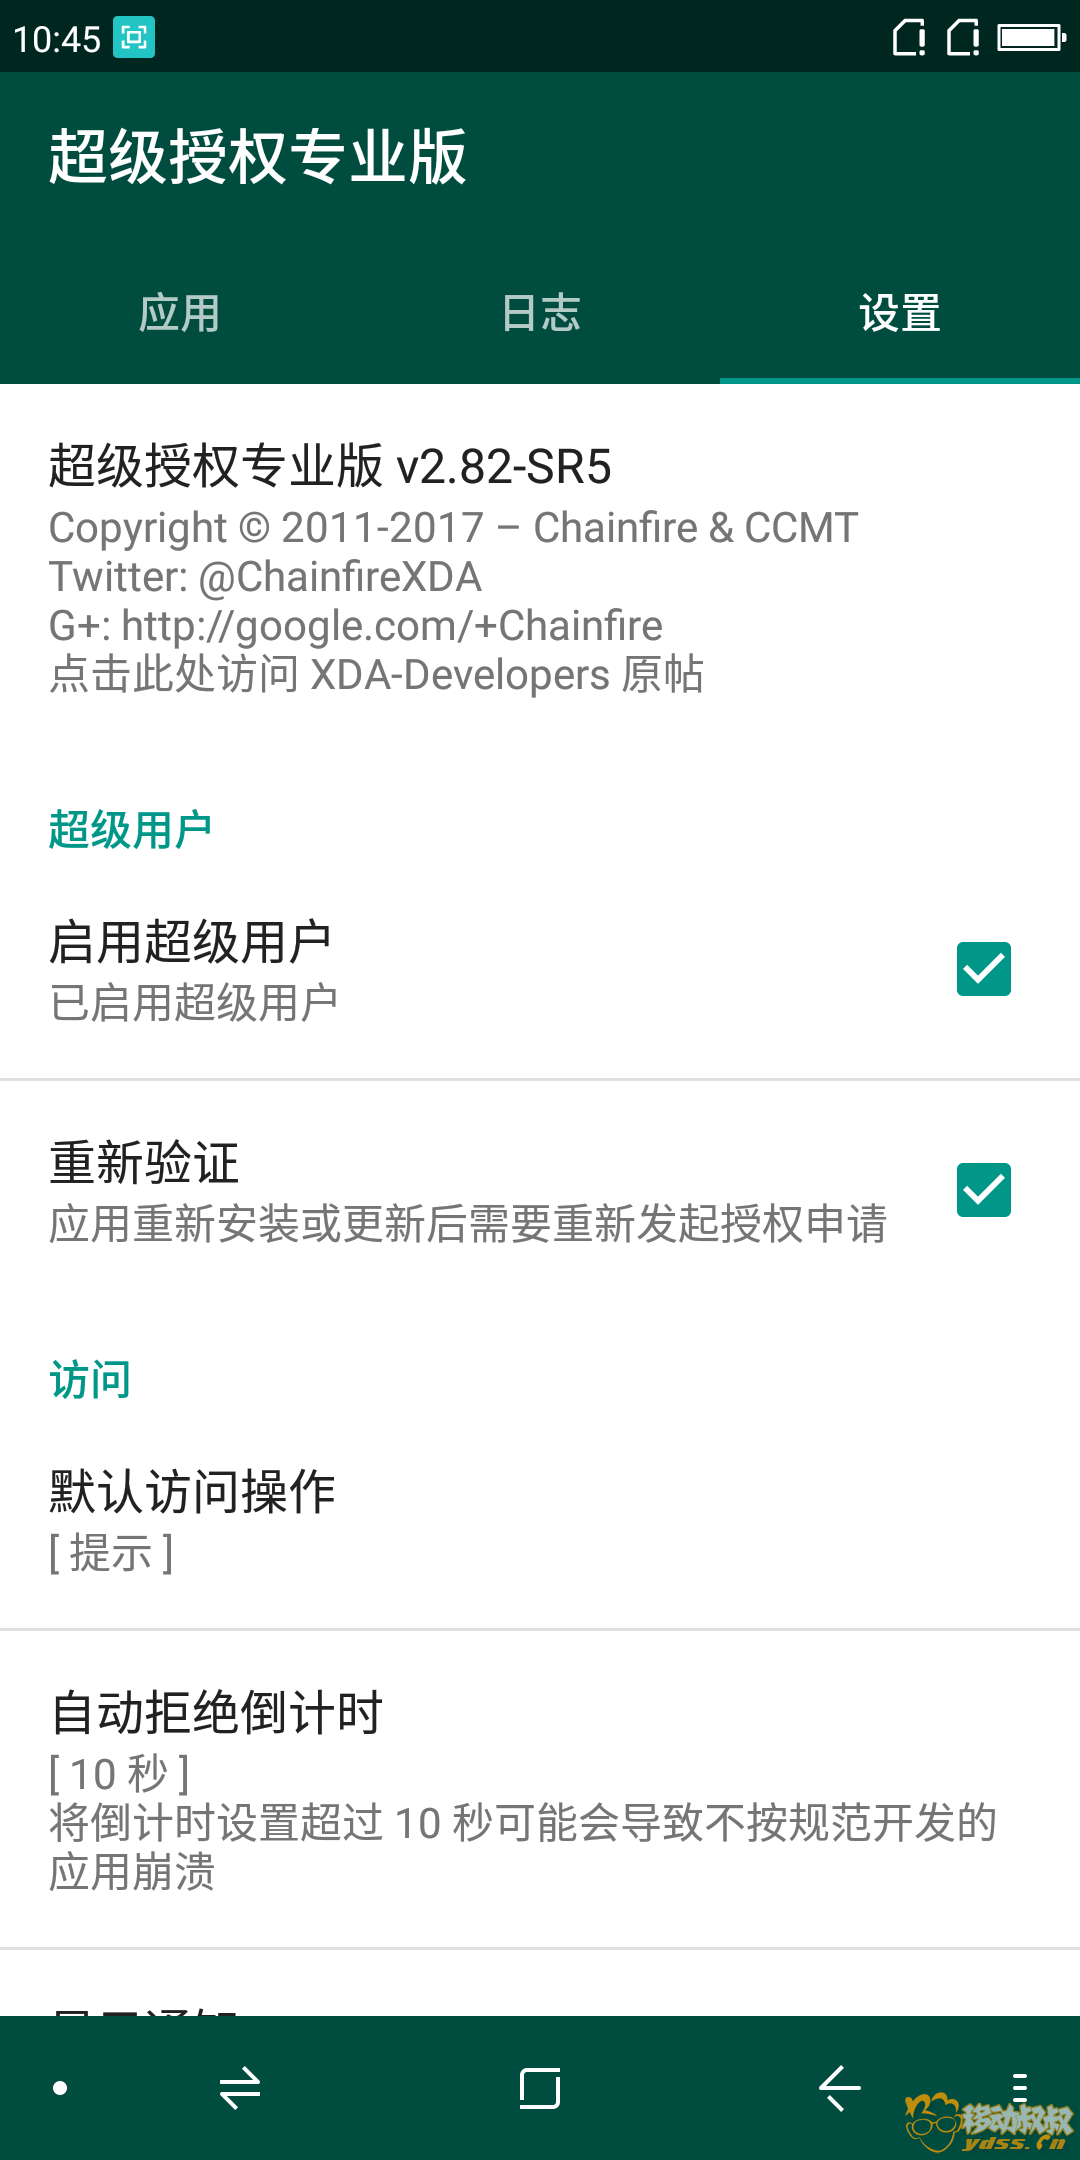 Screenshot_2018-07-12-10-45-23.png